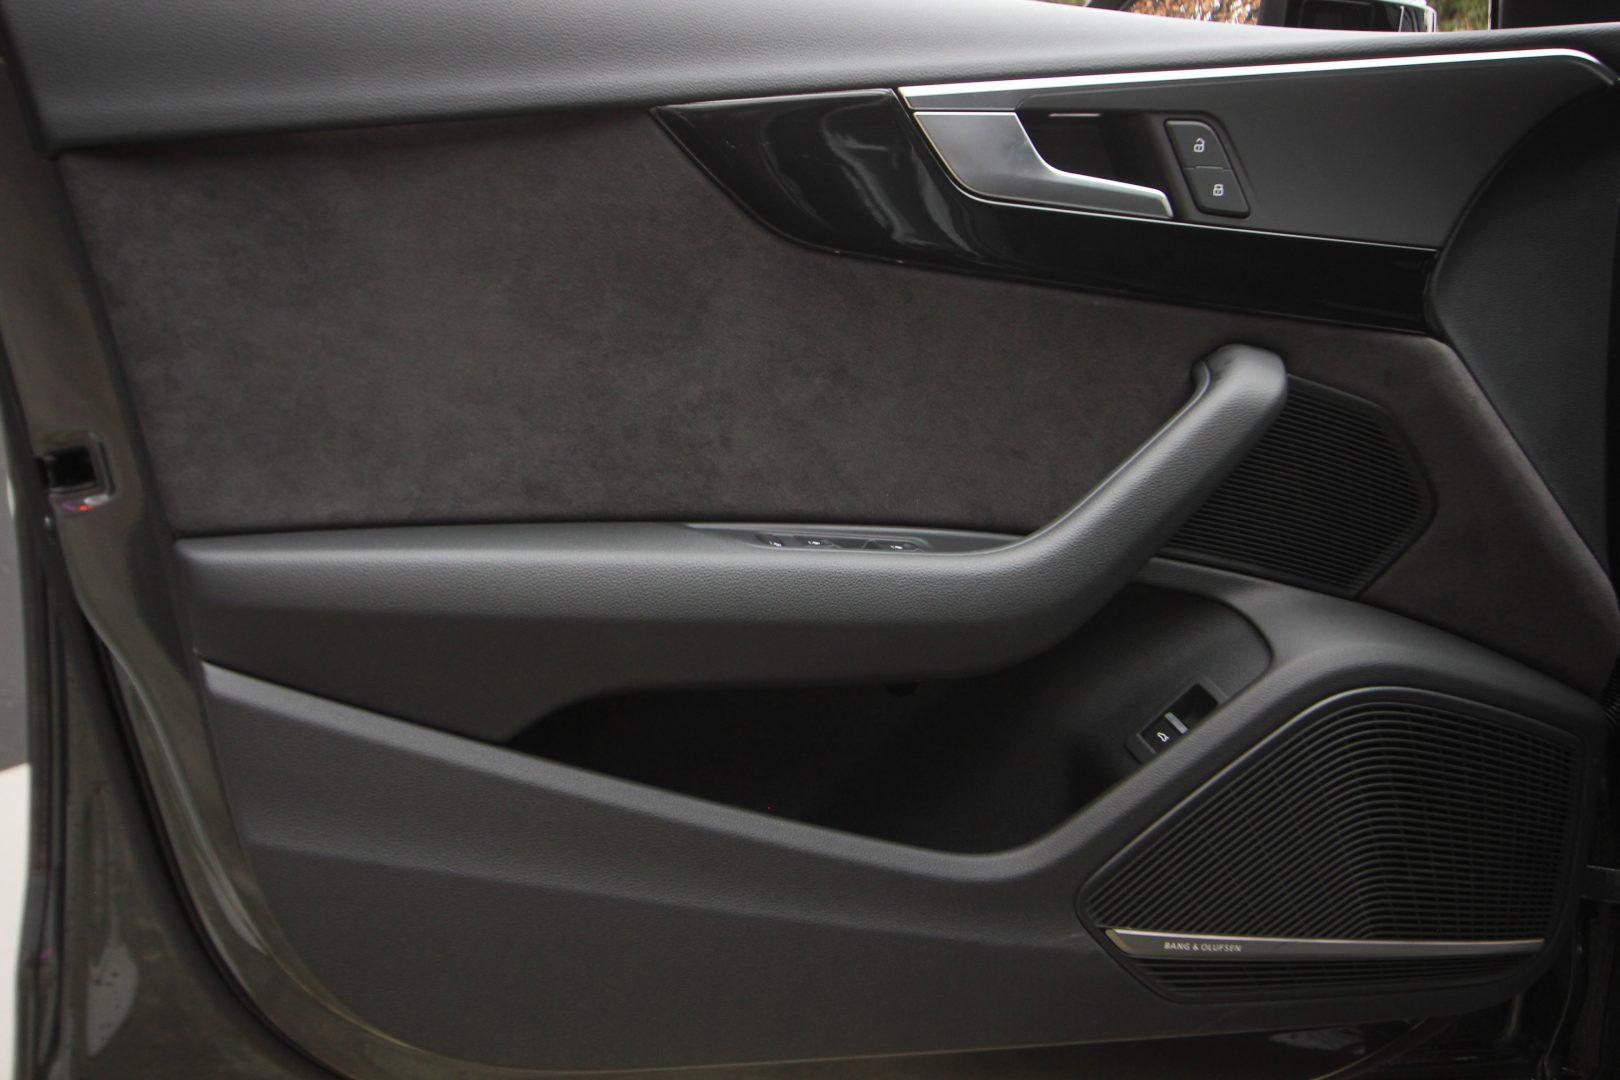 AIL Audi A4 Avant S line Sport / Plus quattro 3.0 TDI 10